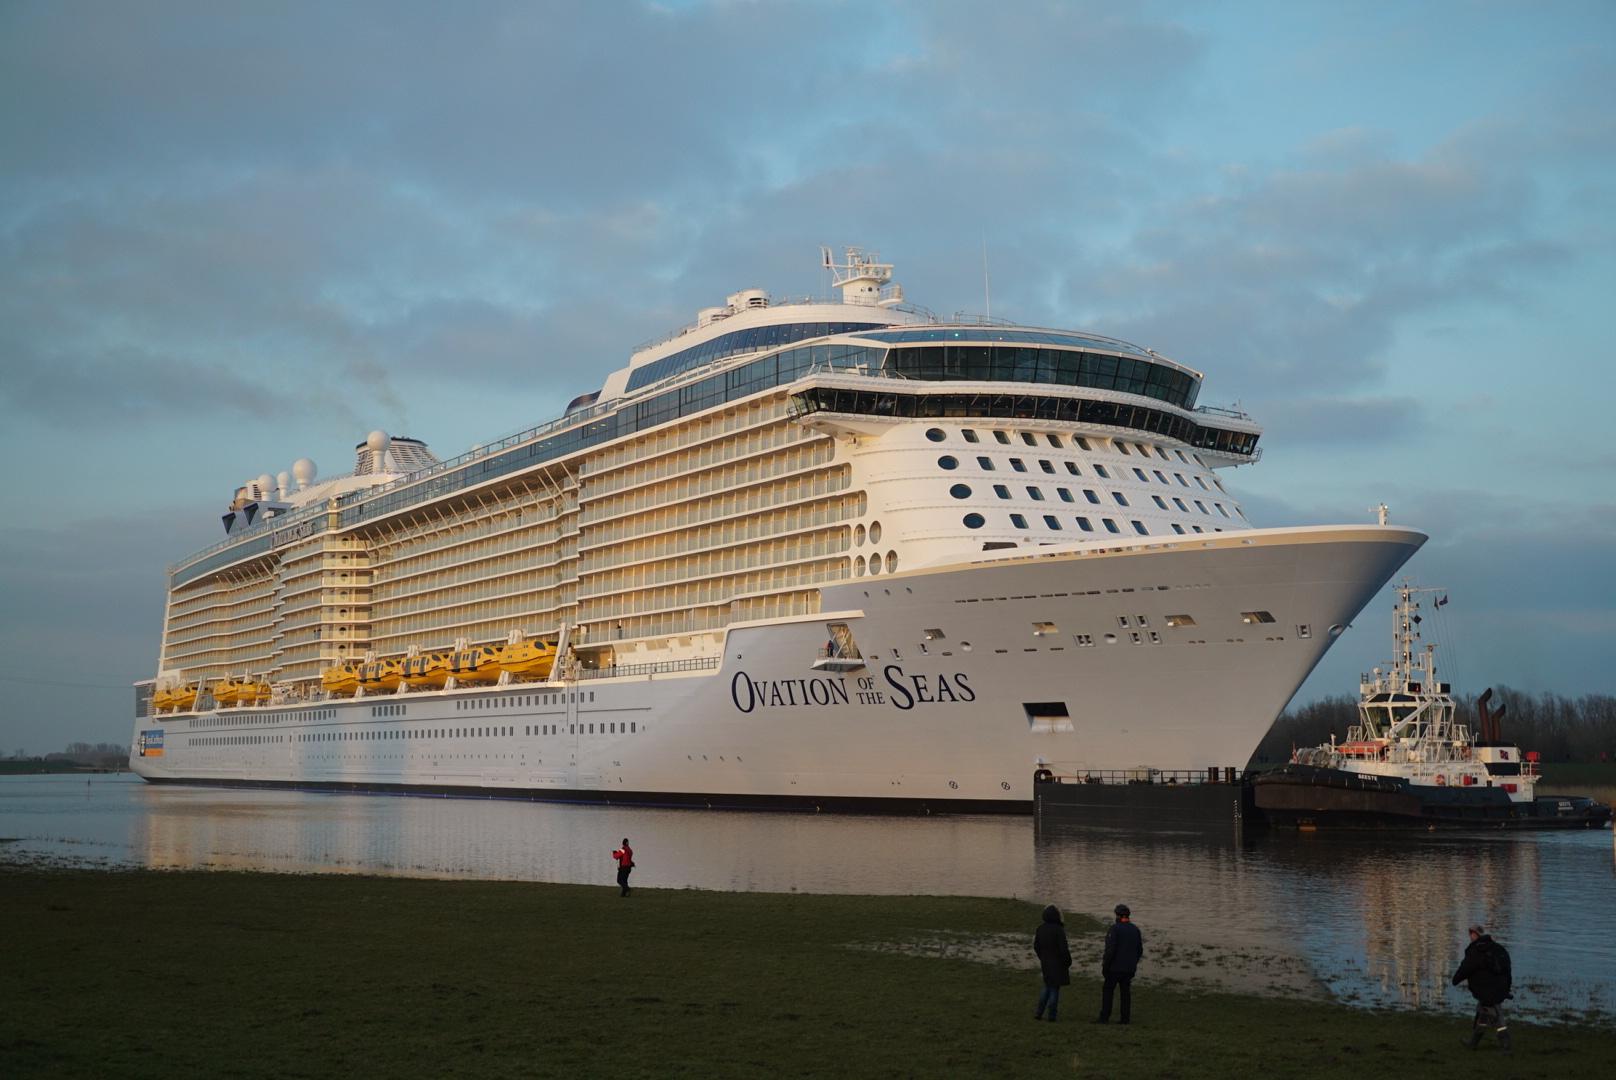 Ovation Of The Seas Leaves The Papenburg Shipyard World